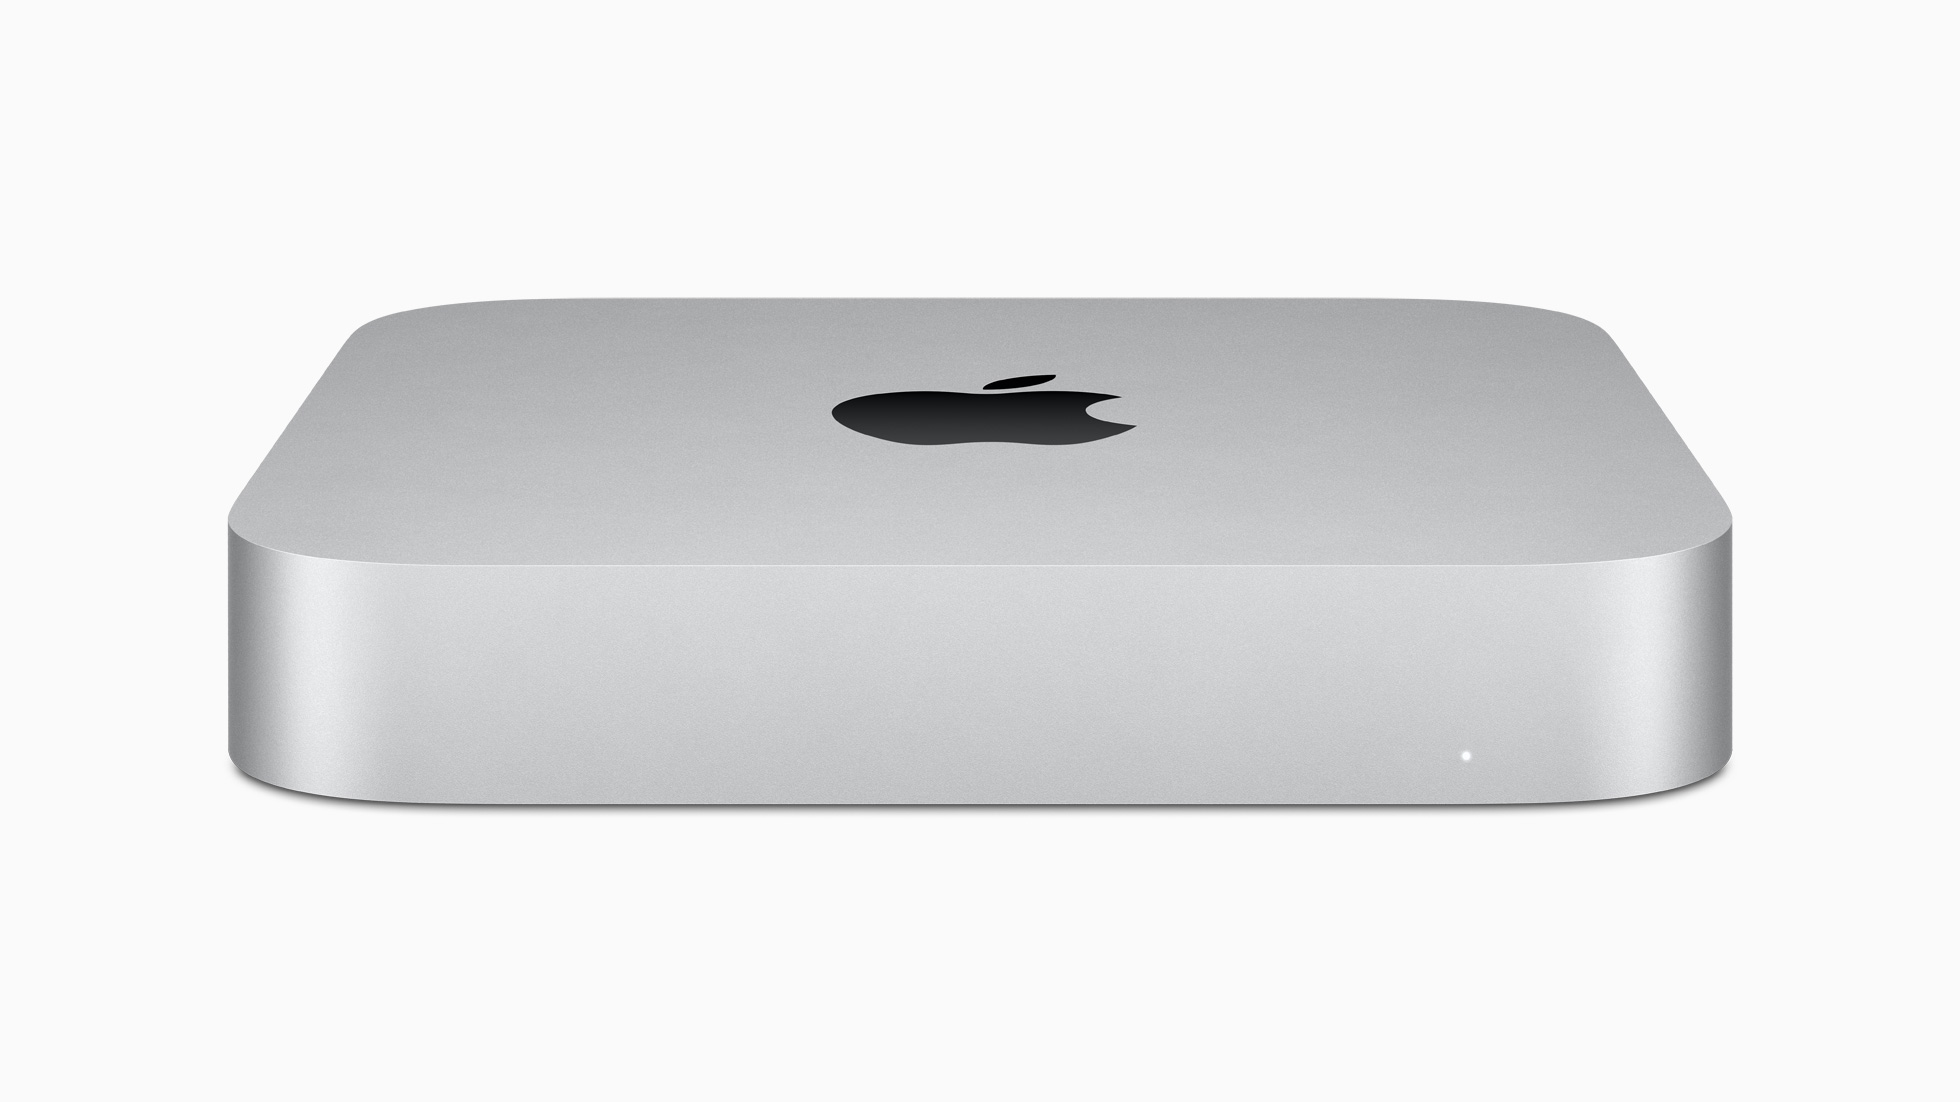 Mac mini M1 image